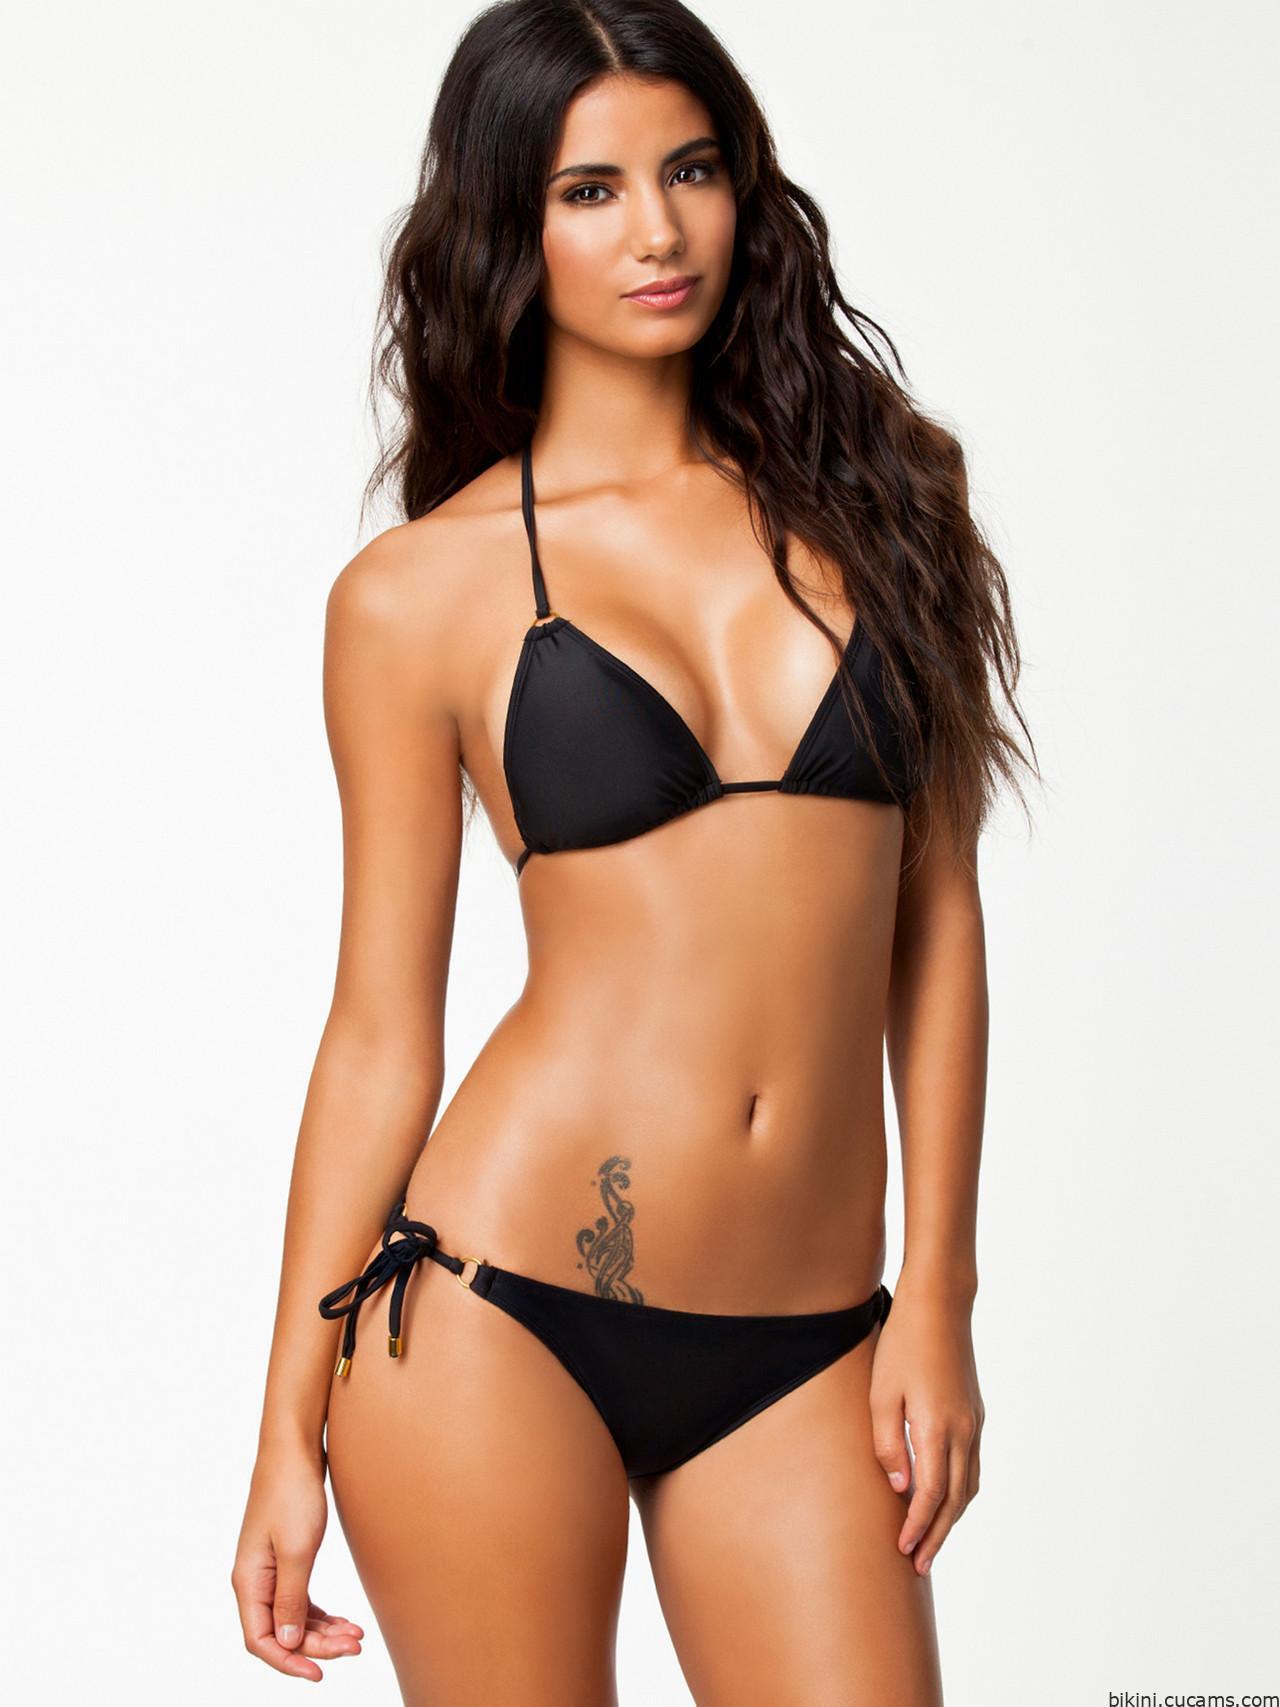 Bikini Solo Innocent by bikini.cucams.com